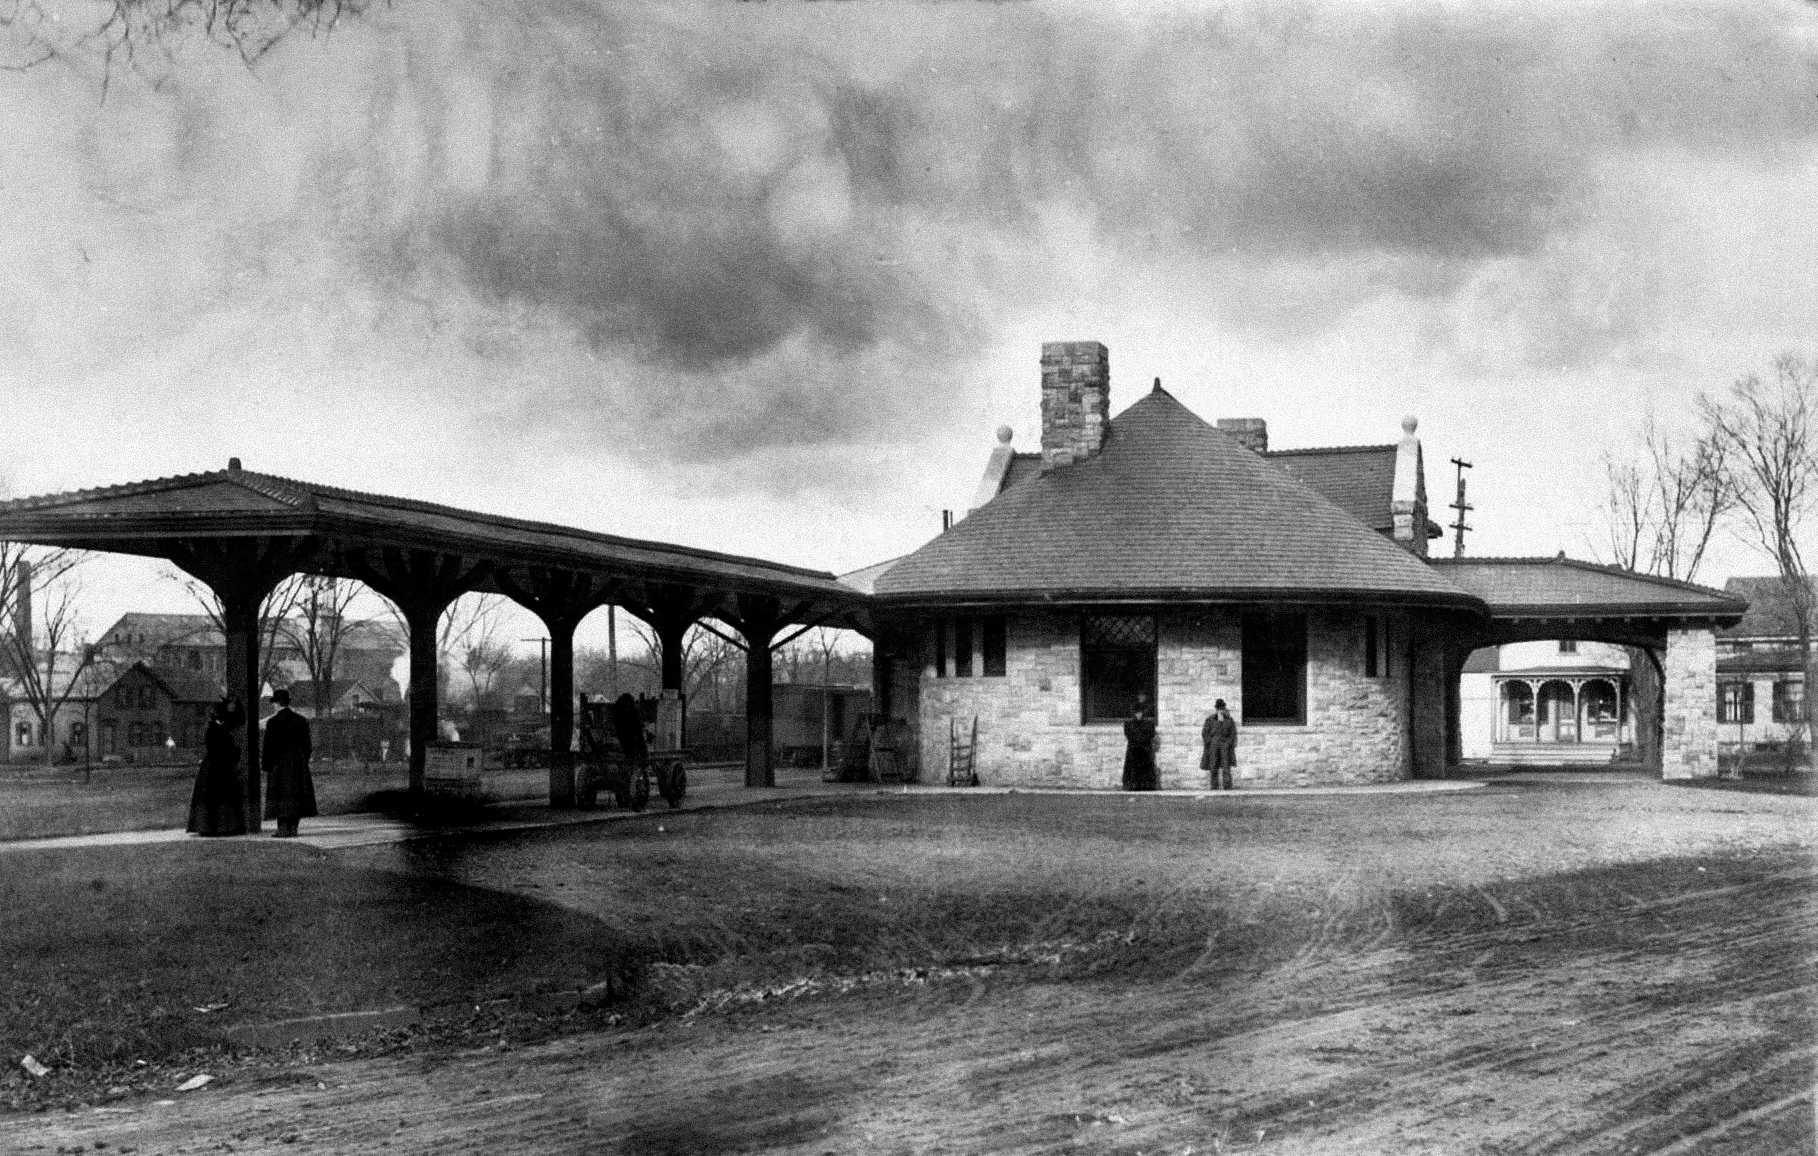 Bennington Railroad Station in 1907. © Image Credit: History InsideOut